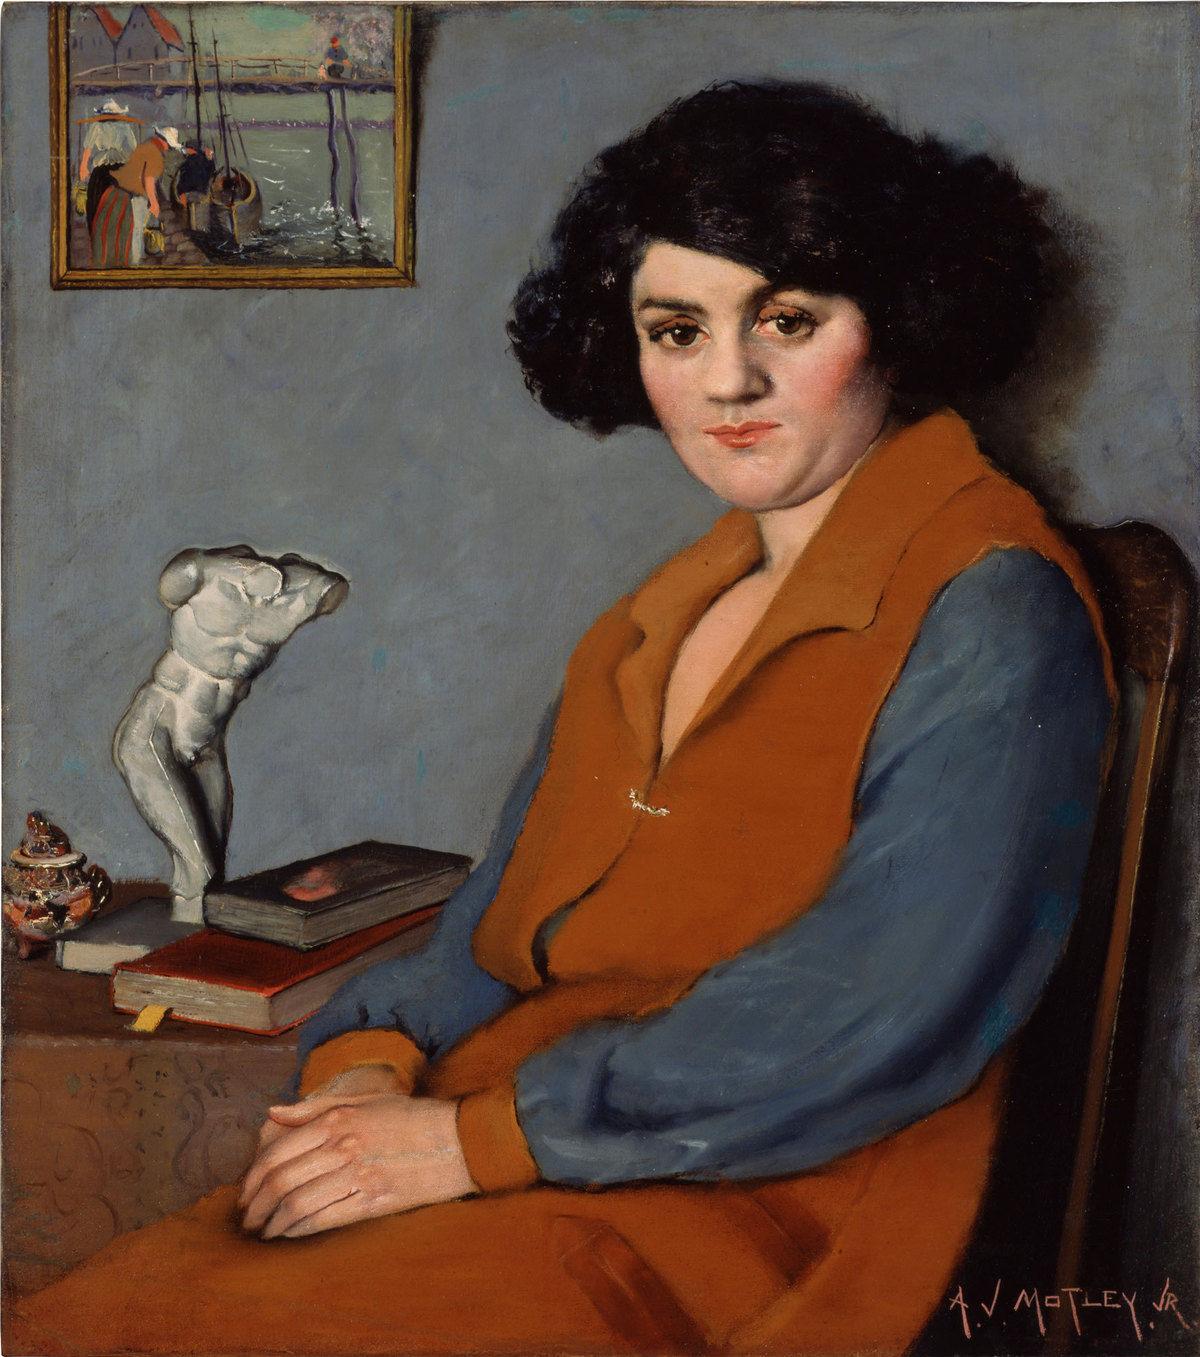 The Mulatress , Archibald Motley Jr., 1920, Whitney Museum of American Art.